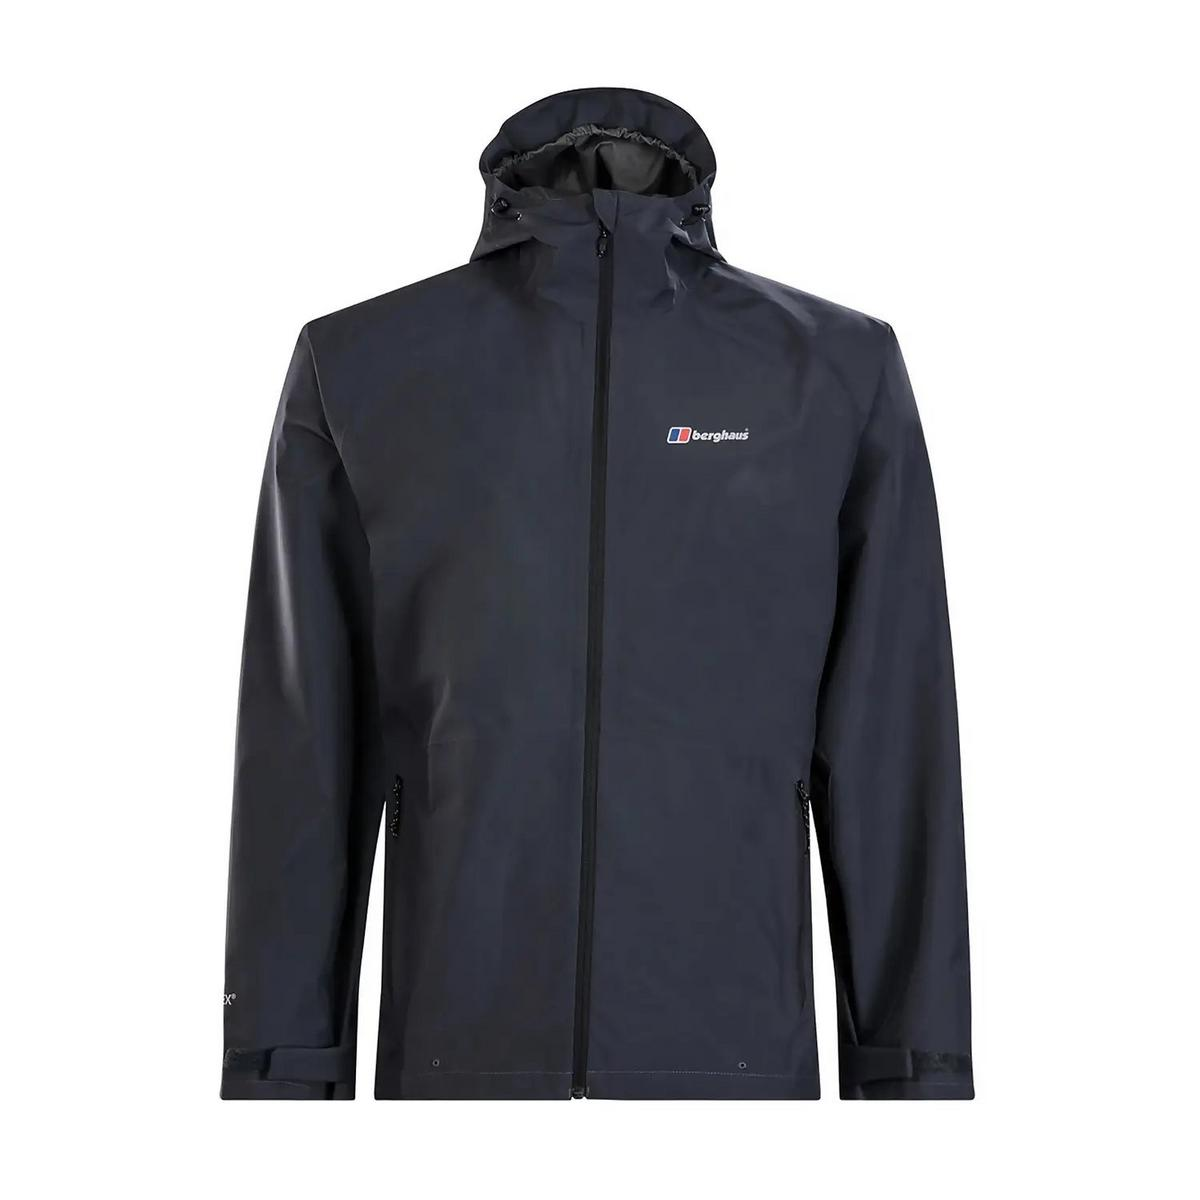 Berghaus Men's Paclite 2.0 Gore-Tex Jacket - Carbon